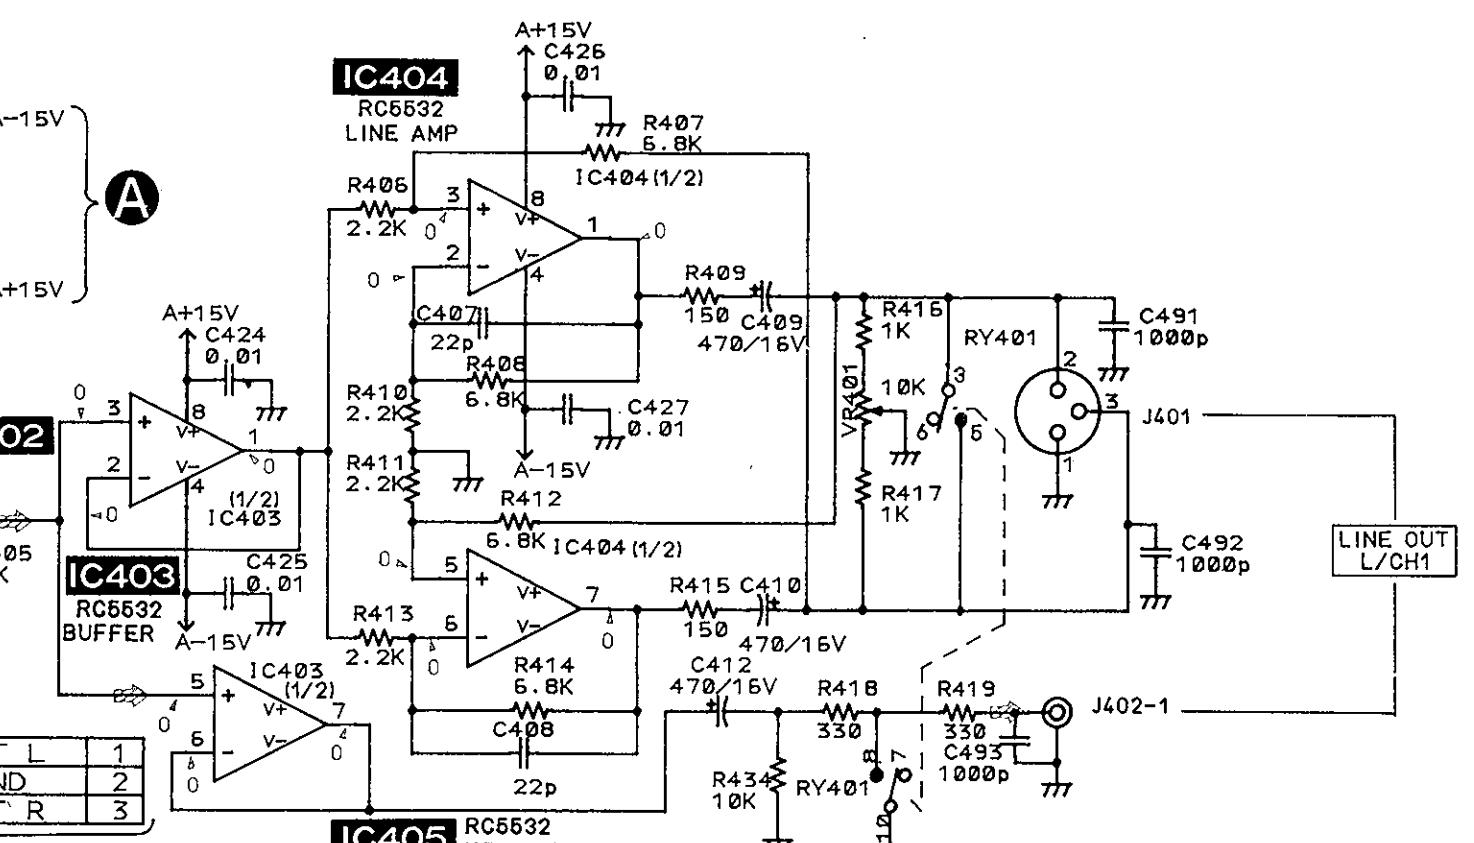 hight resolution of sony cd player wiring diagram imageresizertool com balanced xlr wiring diagram balanced audio cable wiring diagram